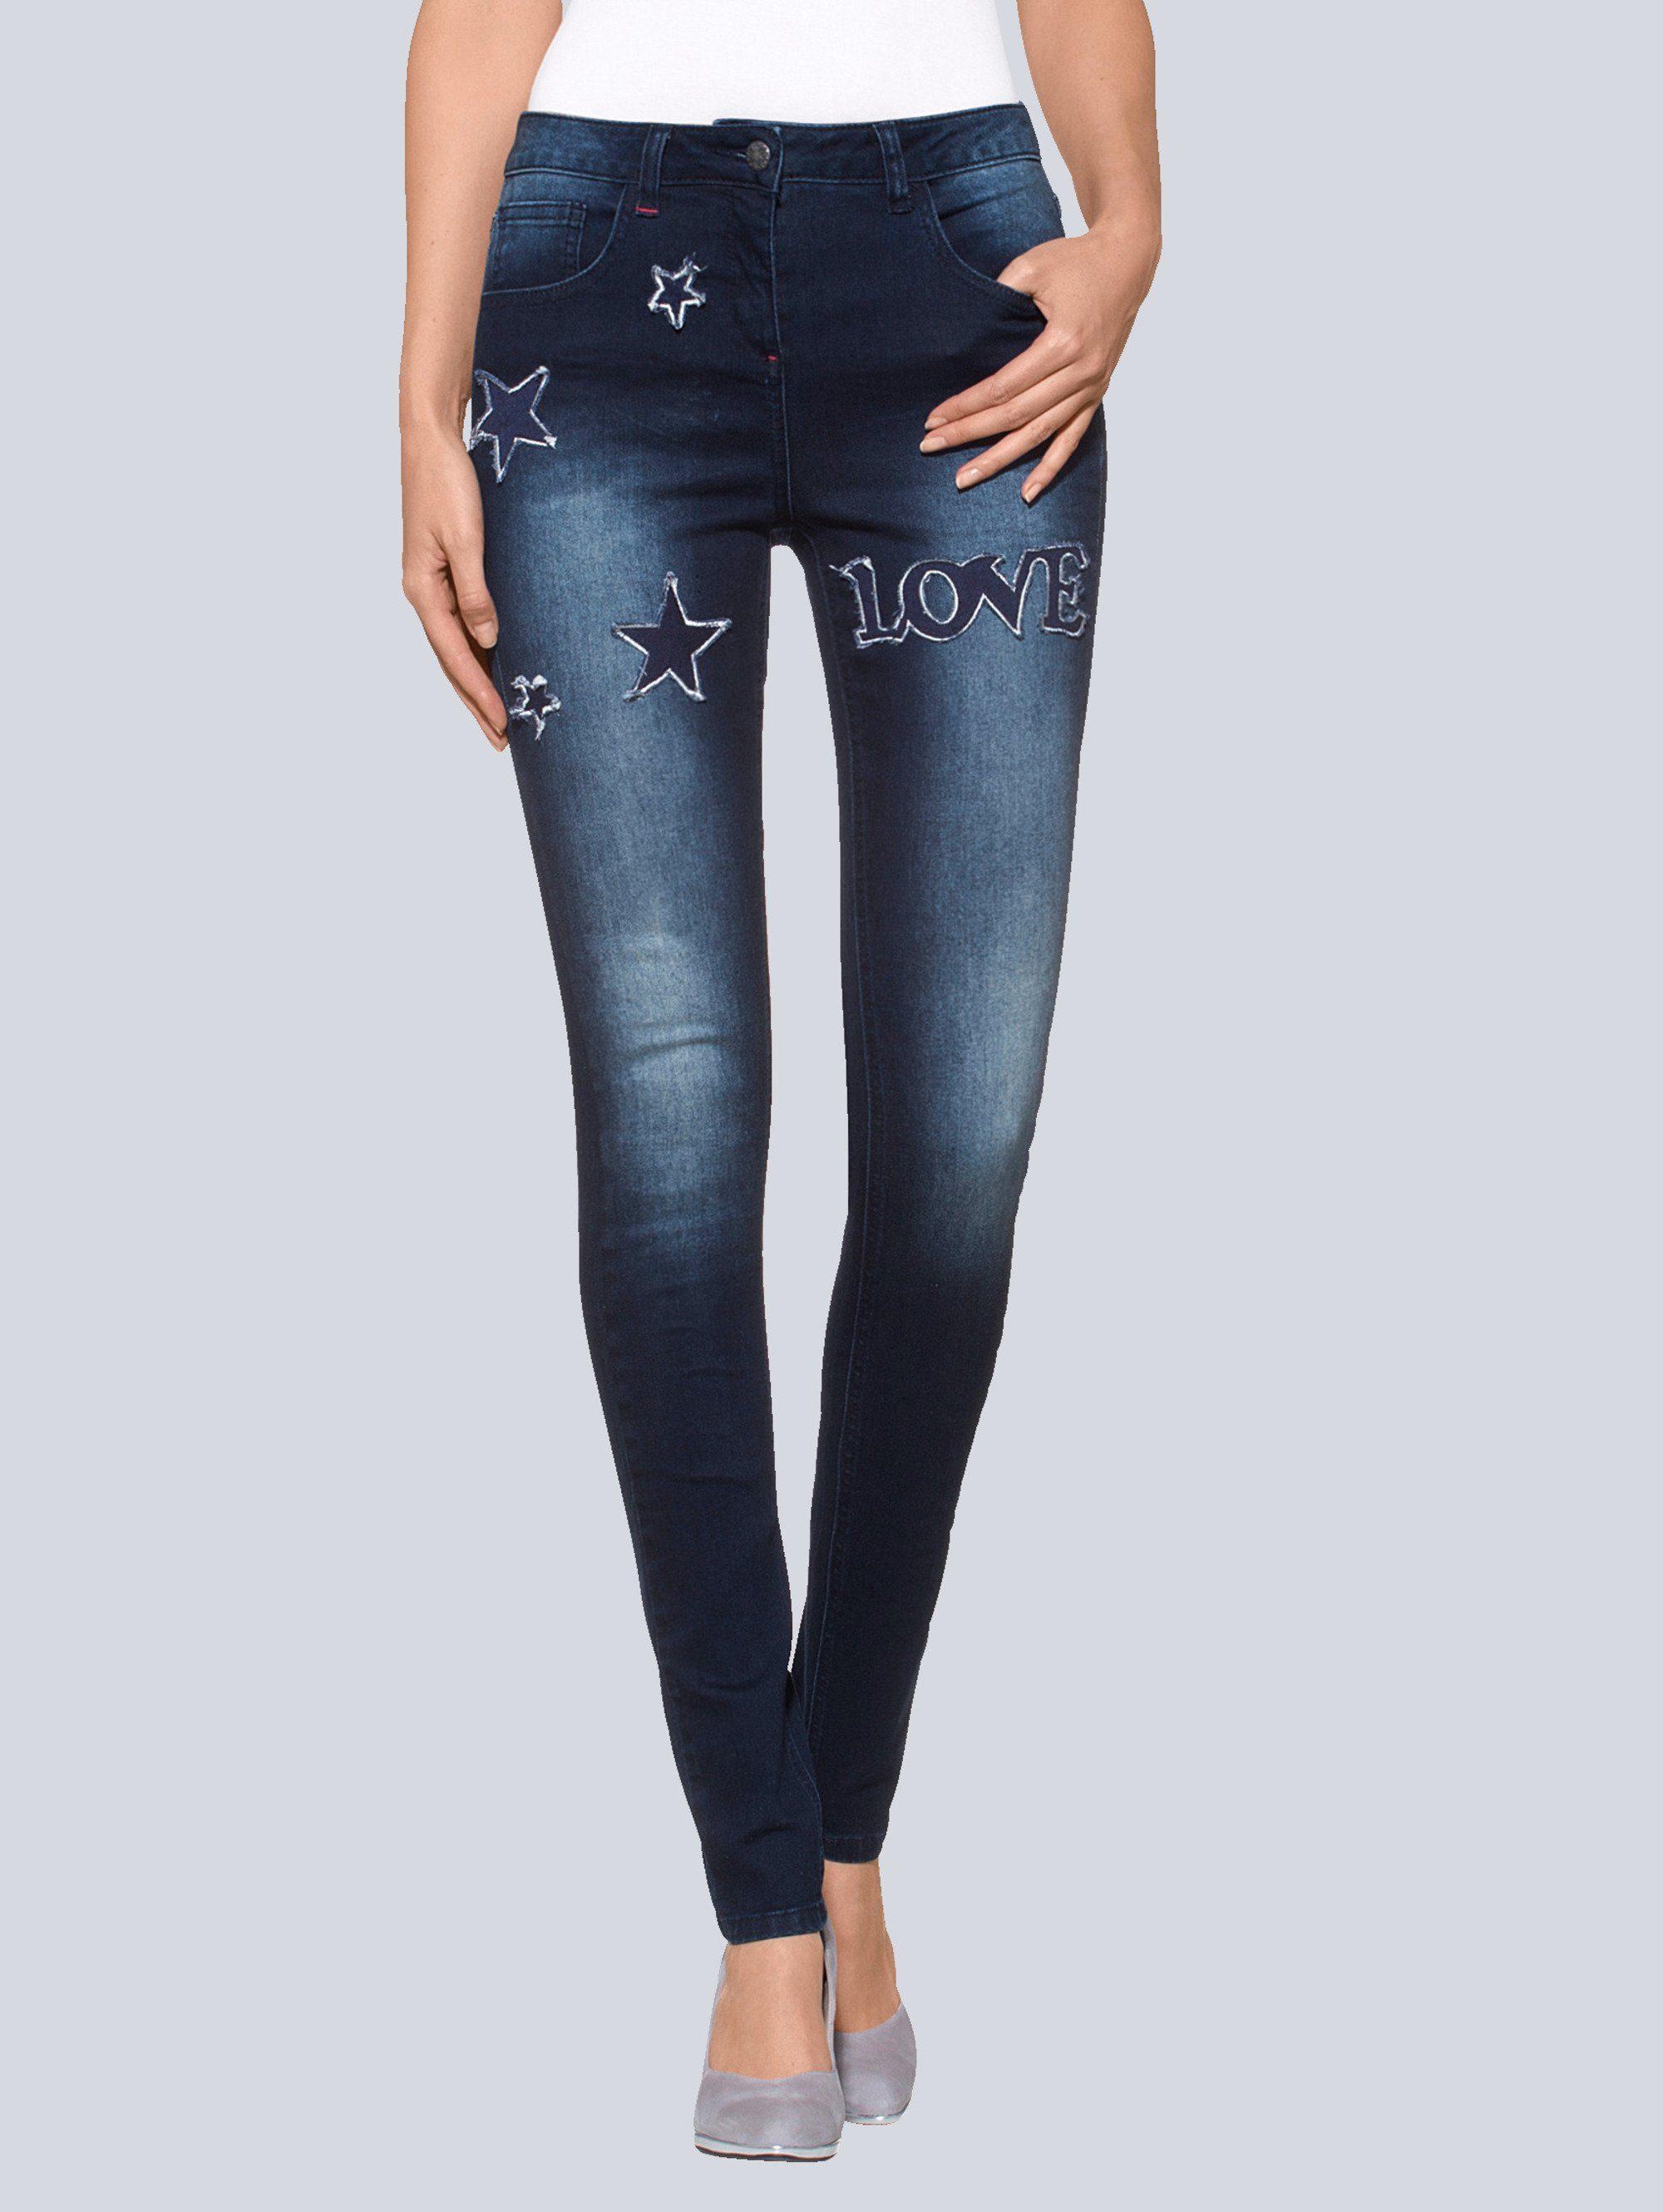 Alba Moda Skinny-Jeans mit Sternenpatch | 04055714348043